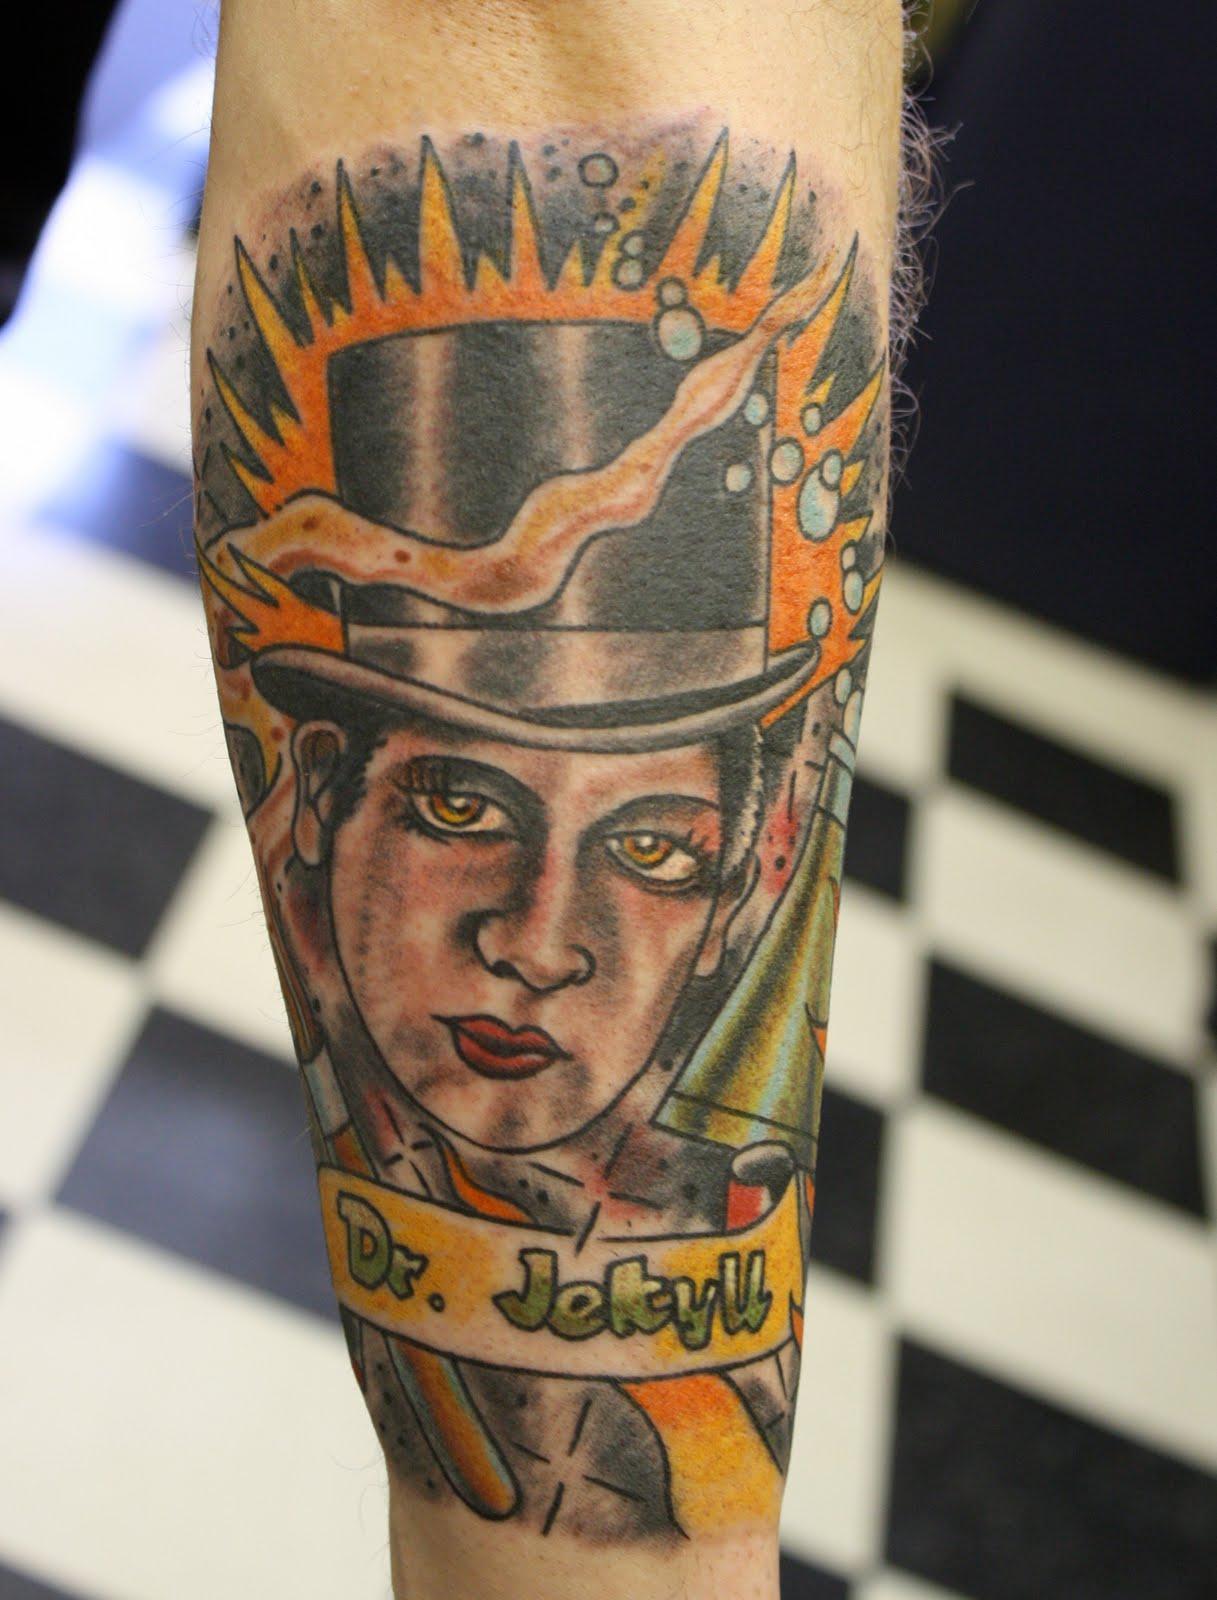 jekyll and hyde tattoo...